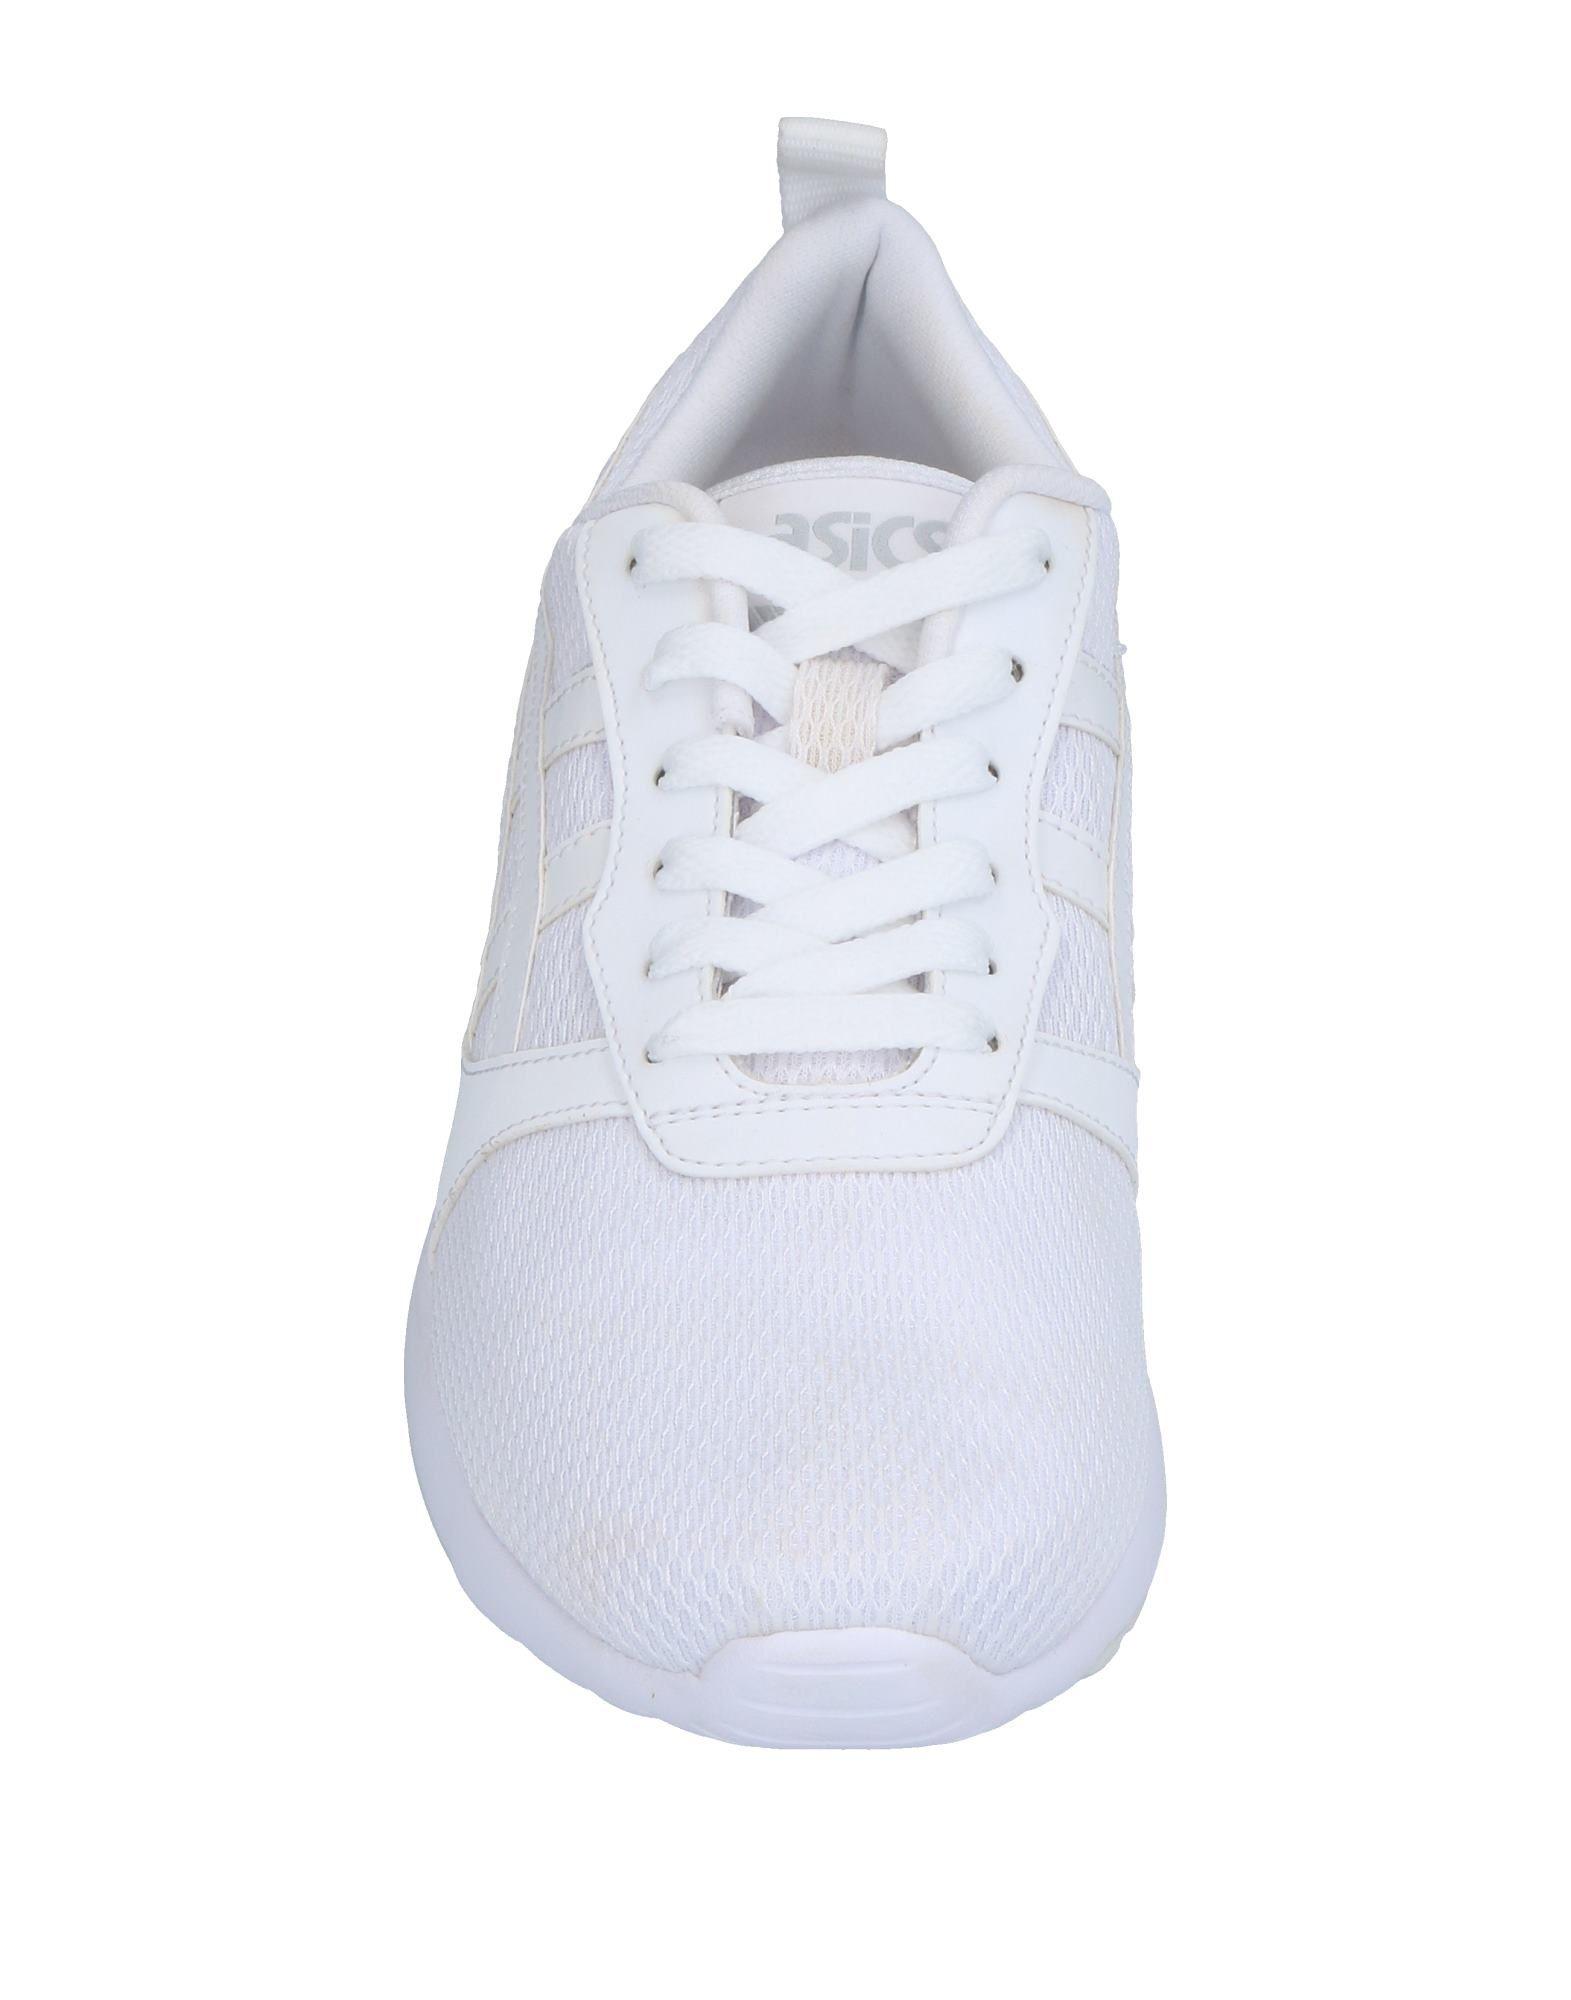 Sneakers Asics Femme - Sneakers Asics sur